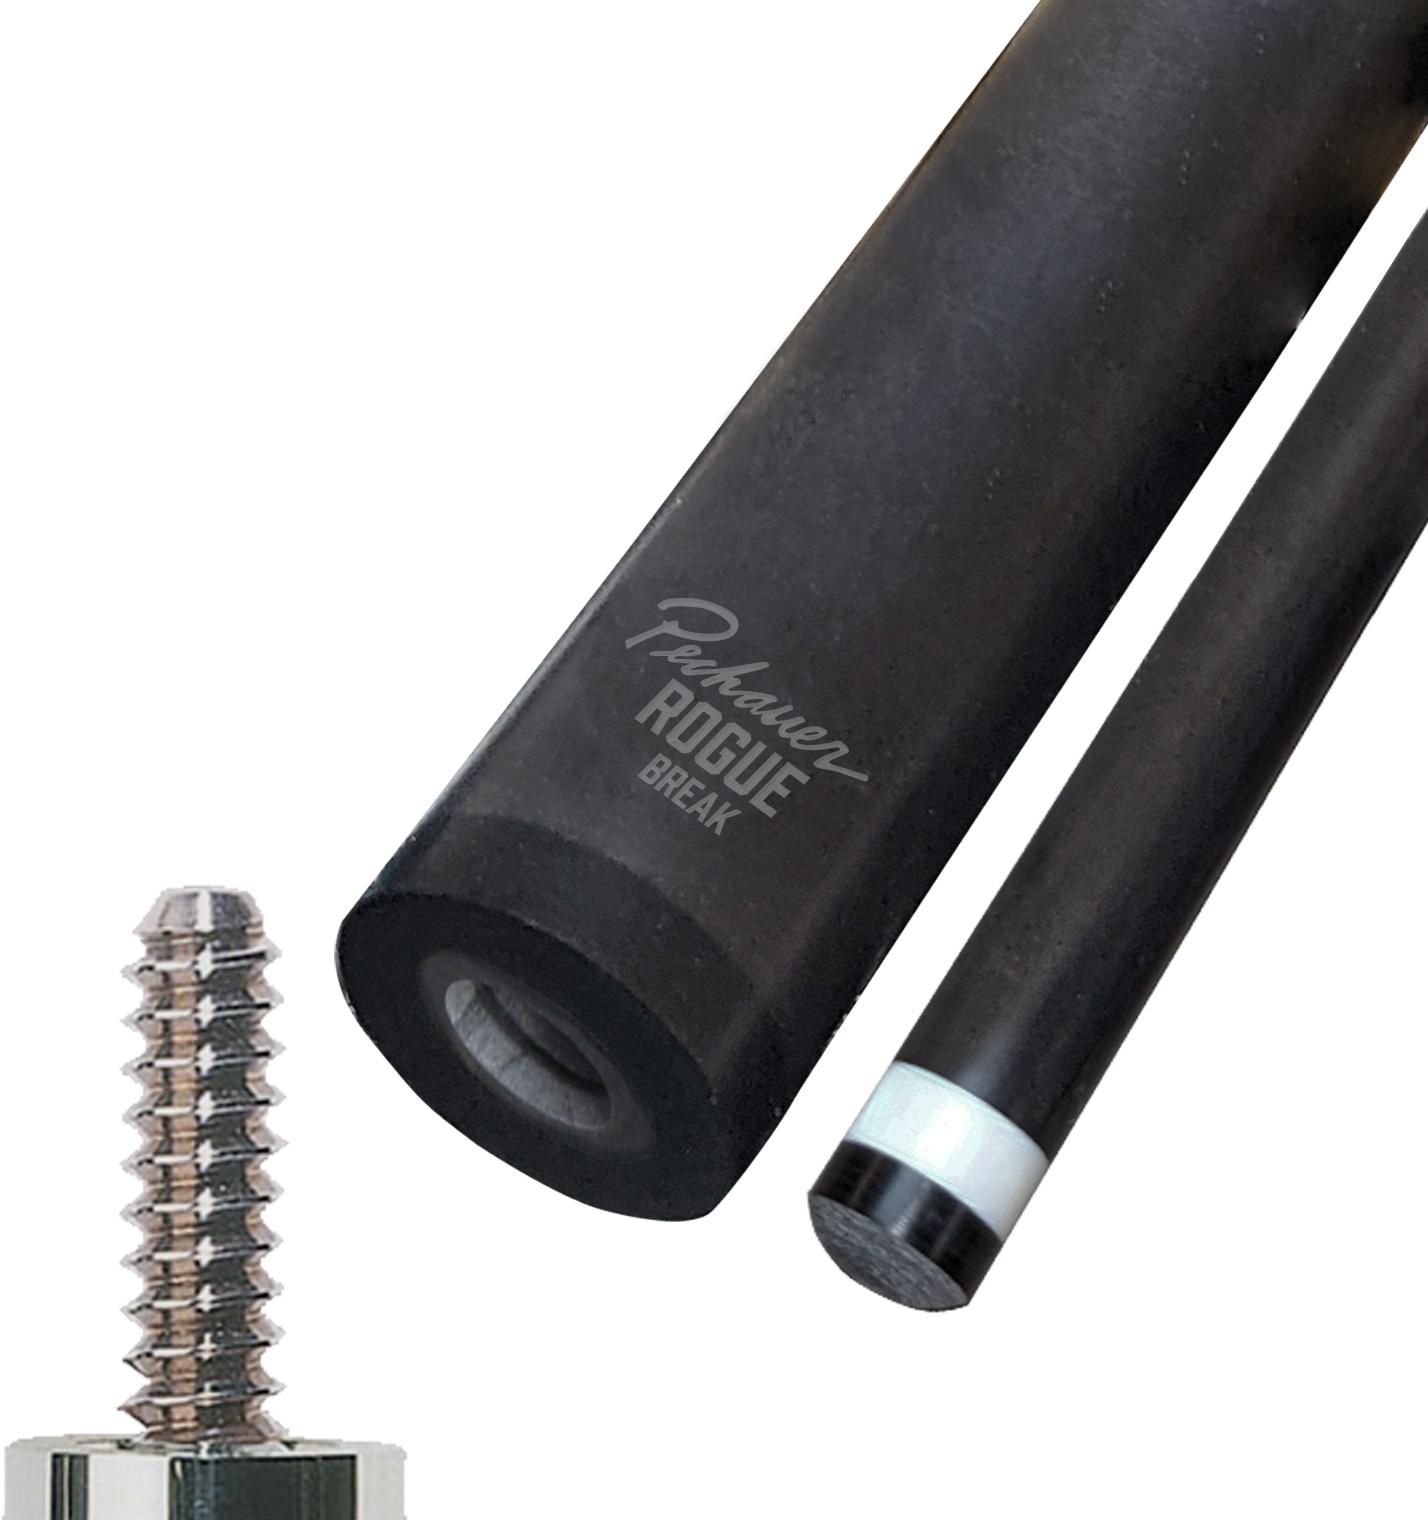 rogue-3-8-x-10-thread-carbon-fiber-shaft